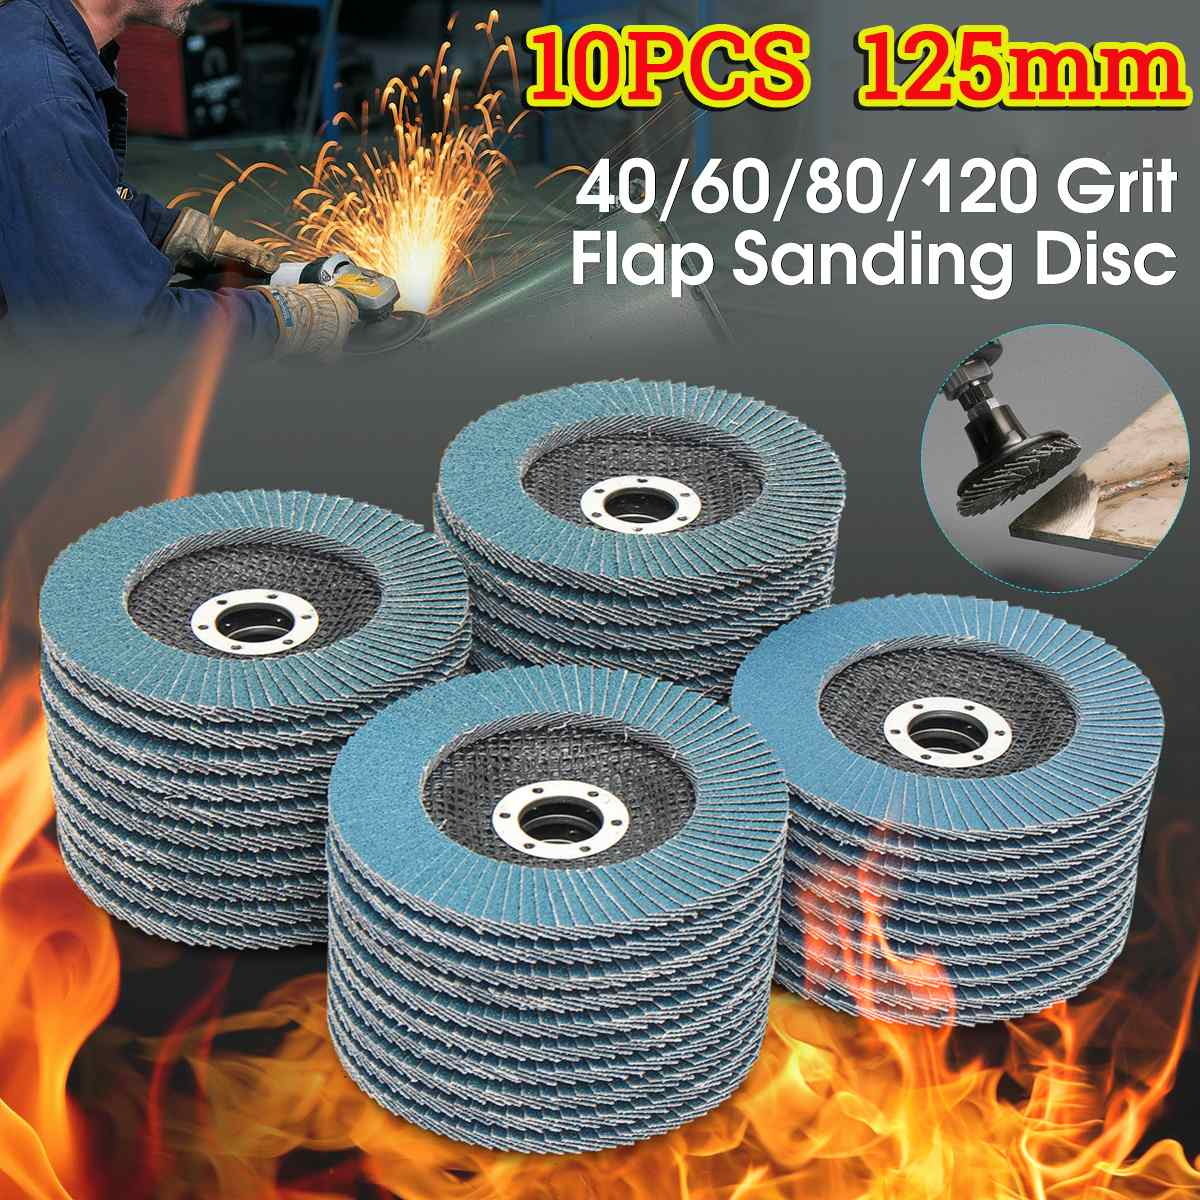 10pcs 125mm dischi lamellari professionali dischi abrasivi da 5 pollici grana 40/60/80/120, lame per mole per smerigliatrice angolare